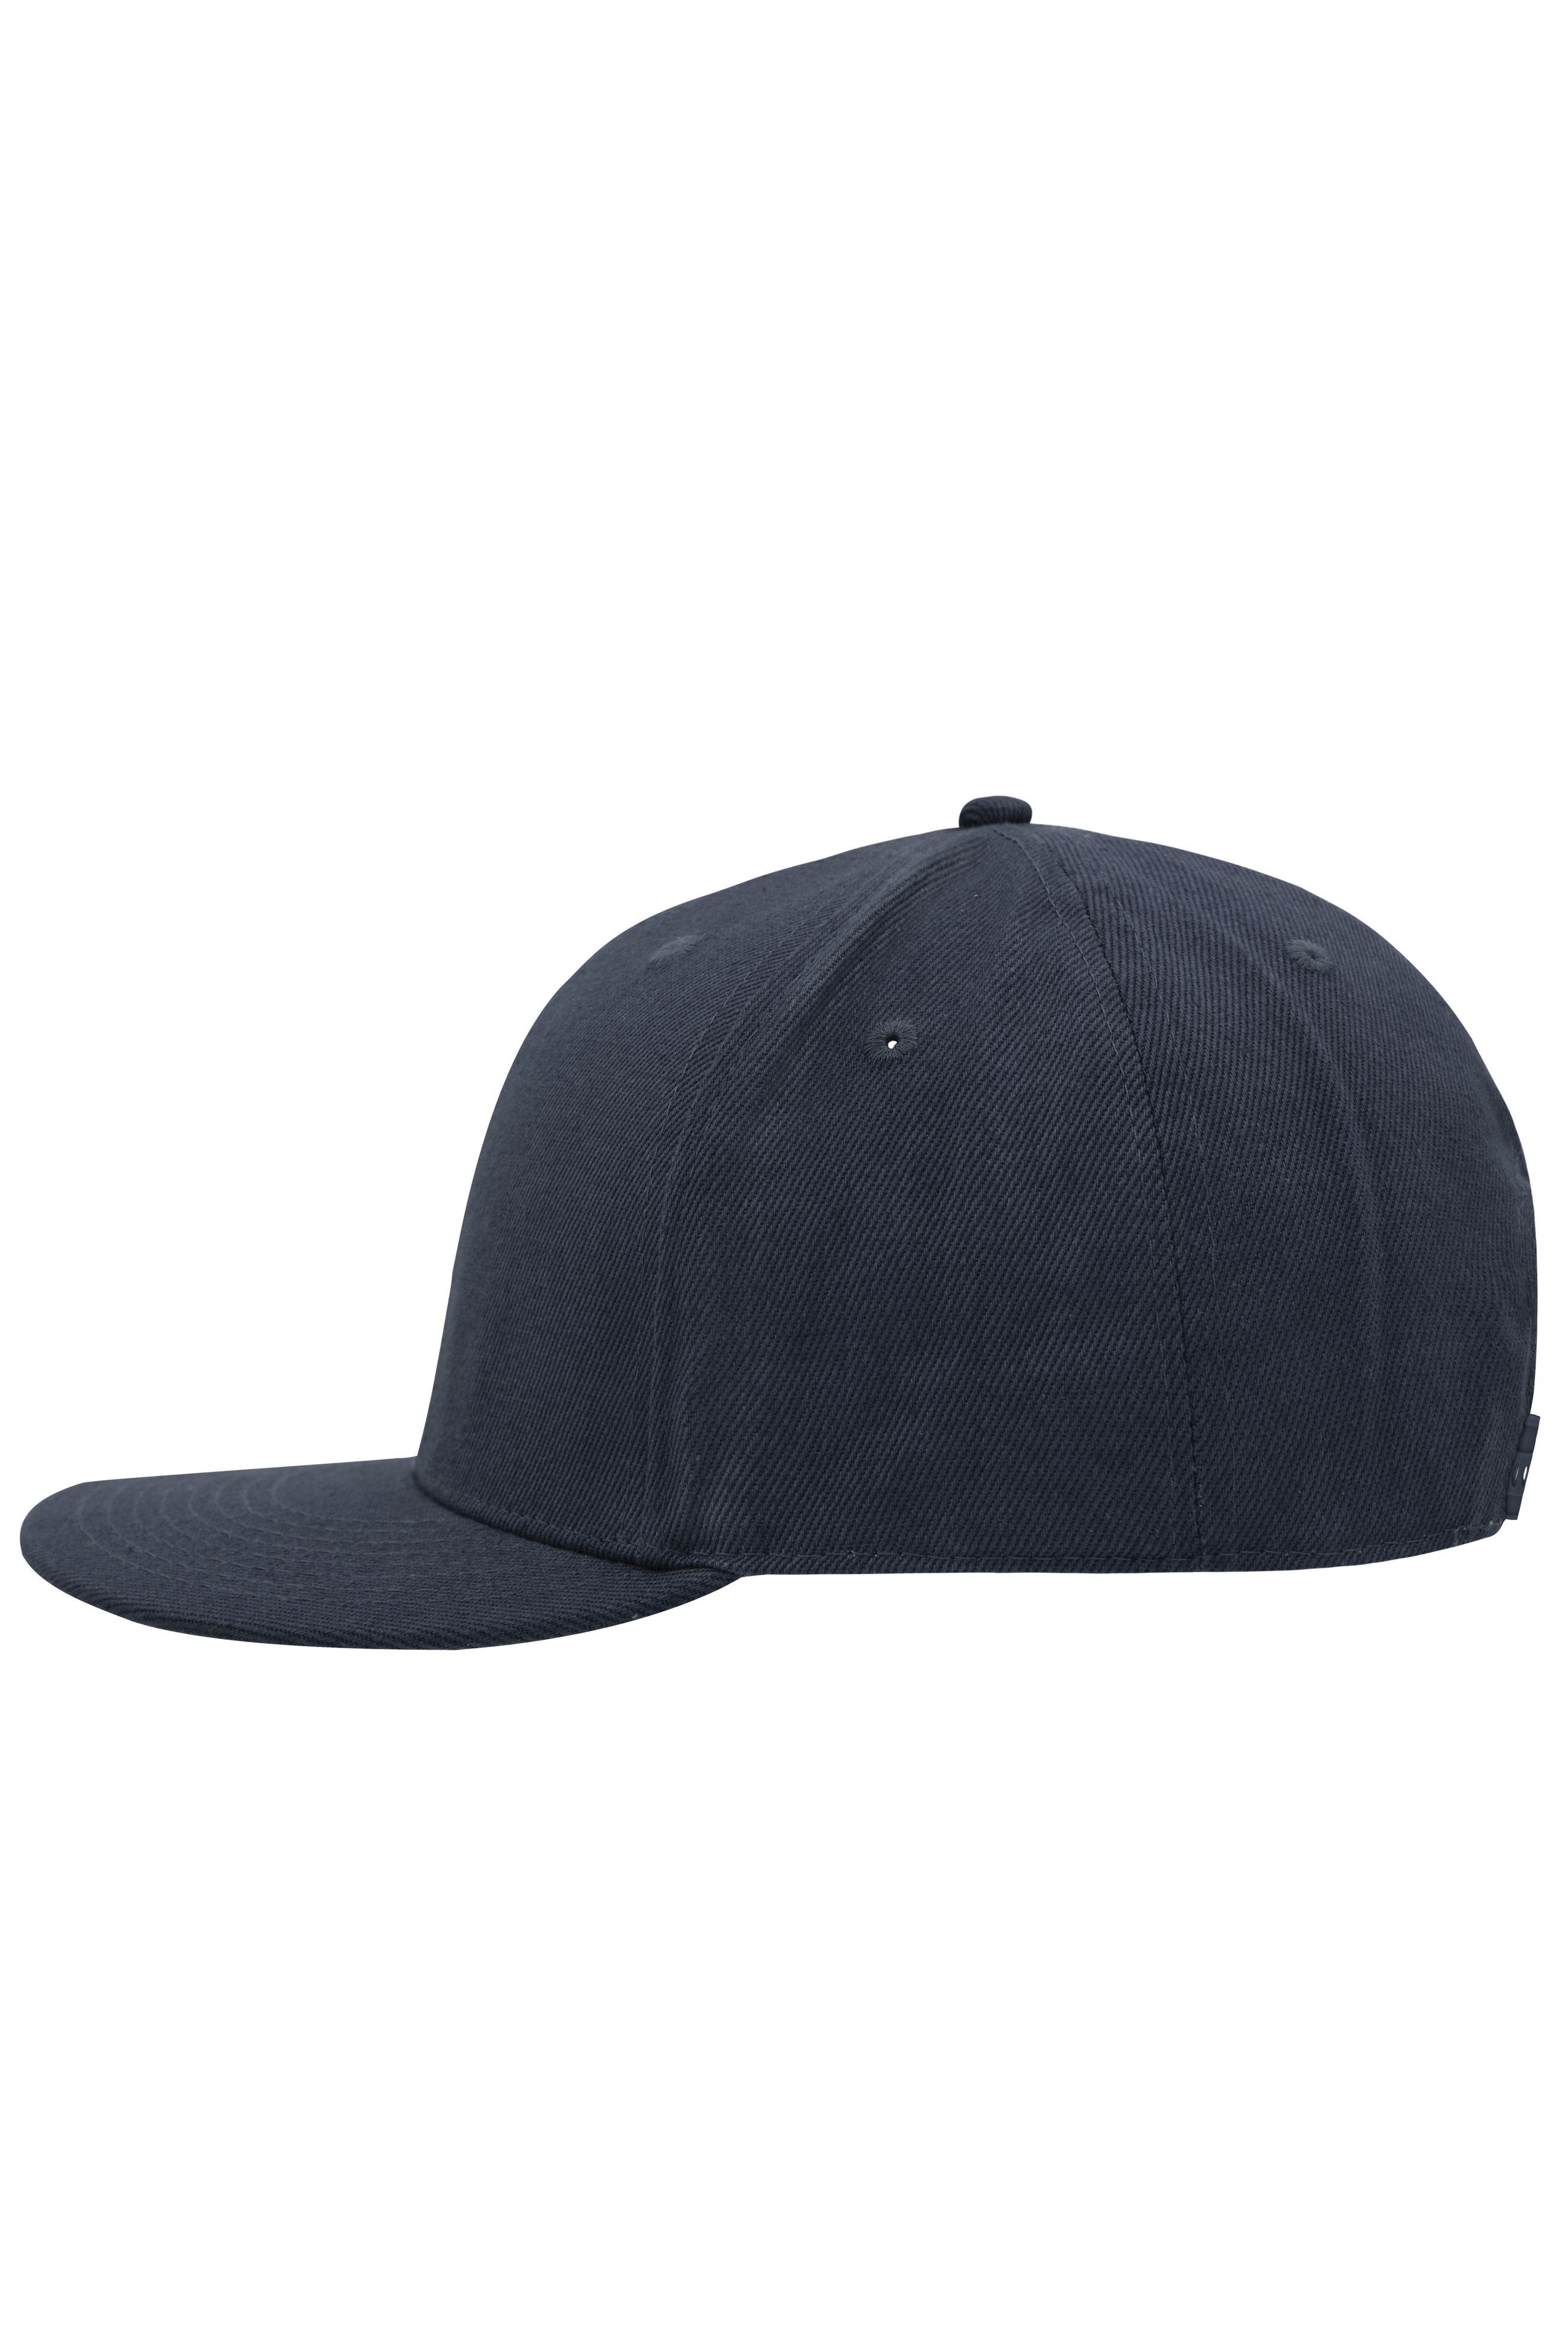 Cap mit Streetstyle Charakter